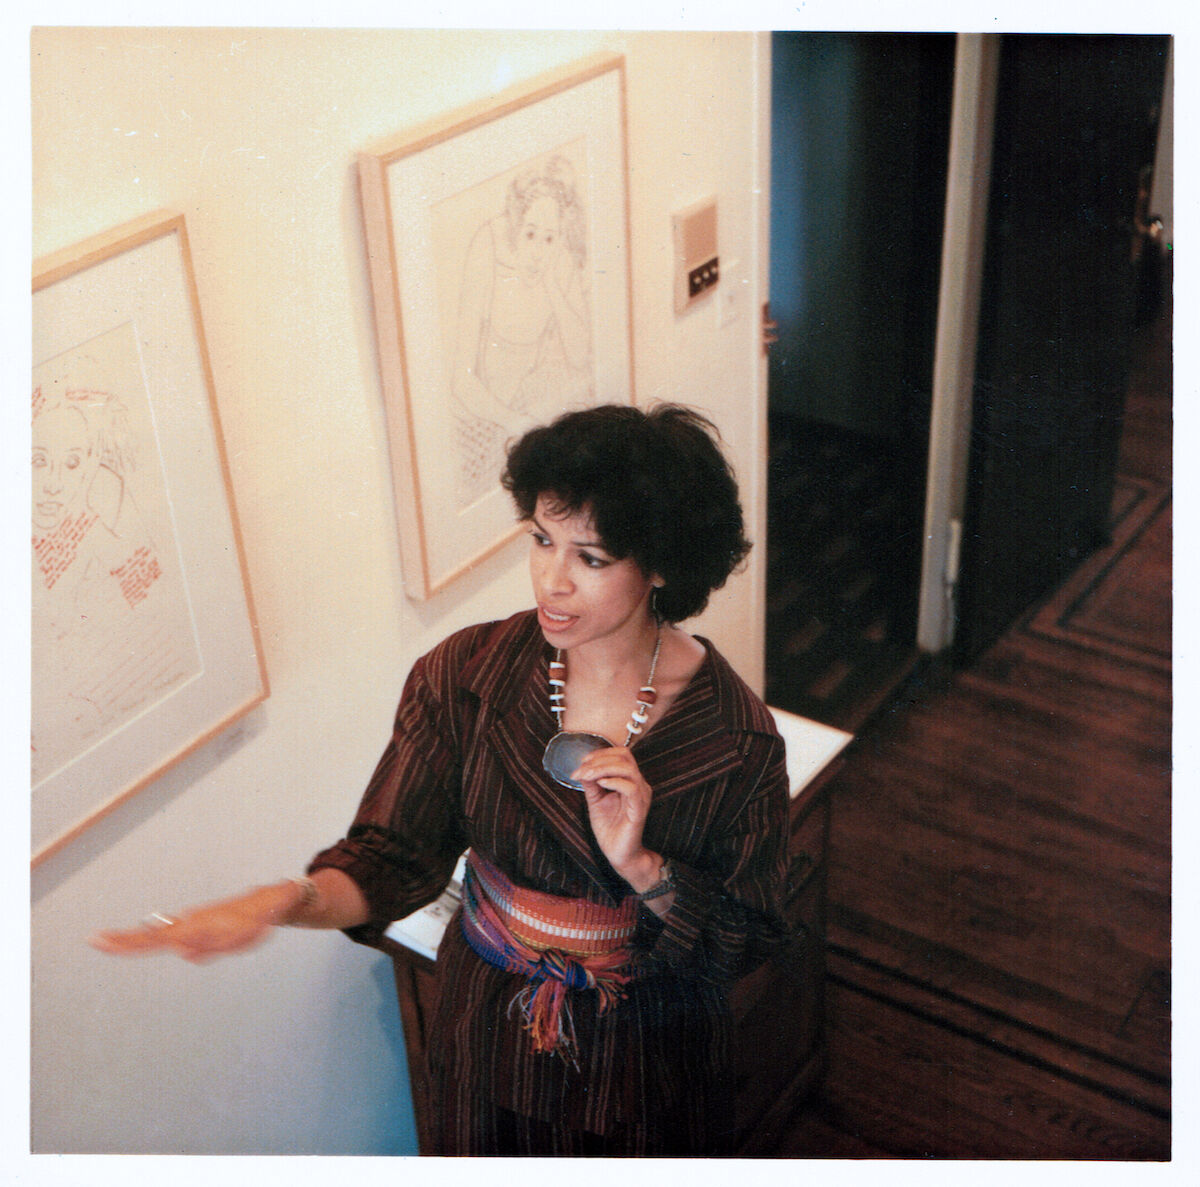 Emma Amos at the Art Salon Show, 1979. Courtesy Ryan Lee.